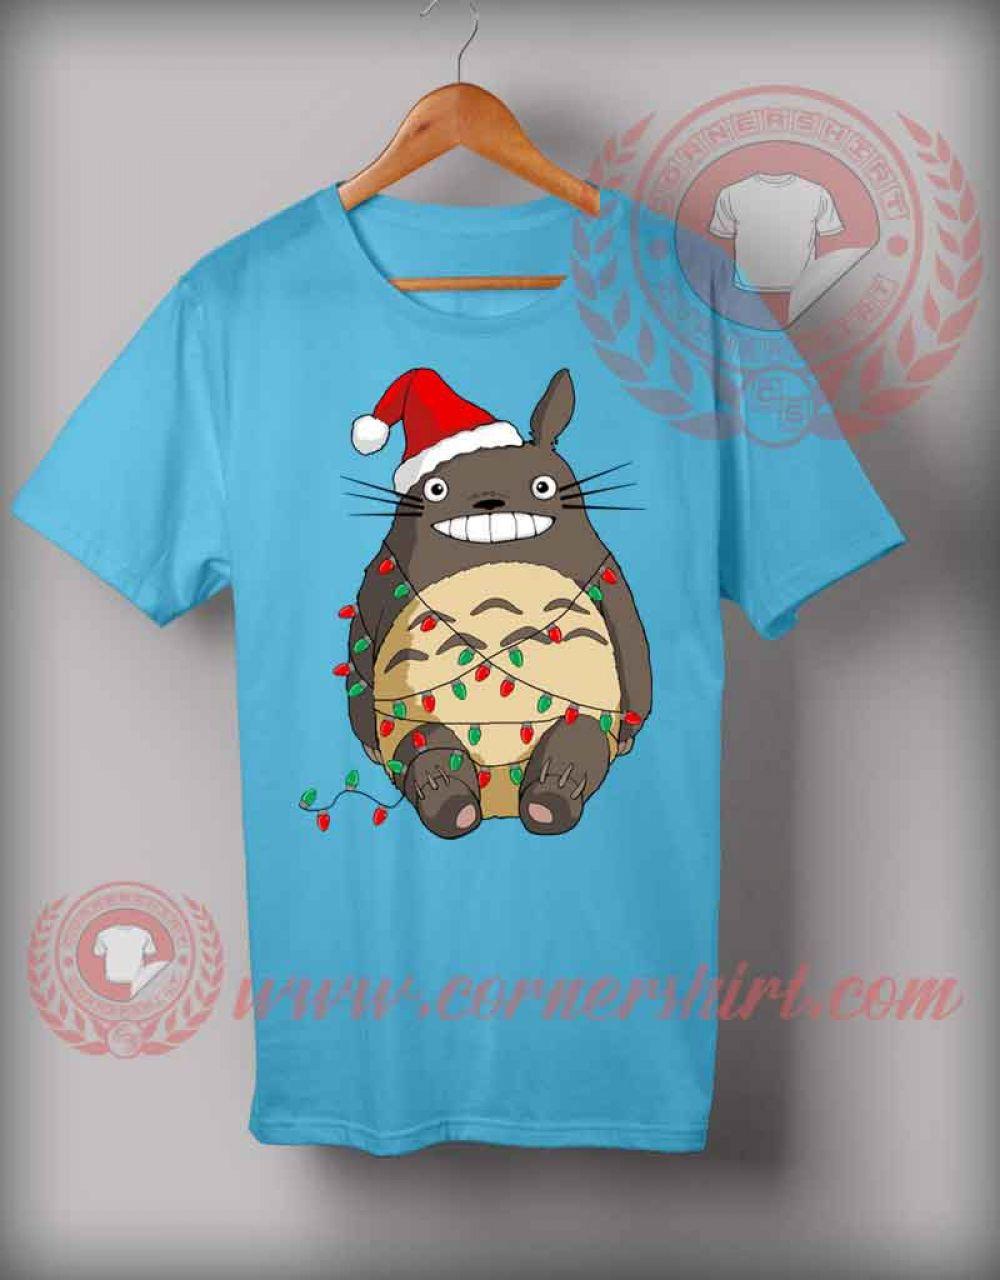 Fotos Cena Navidad Frinsa.Santa Totoro T Shirt Funny Christmas Gifts For Friends